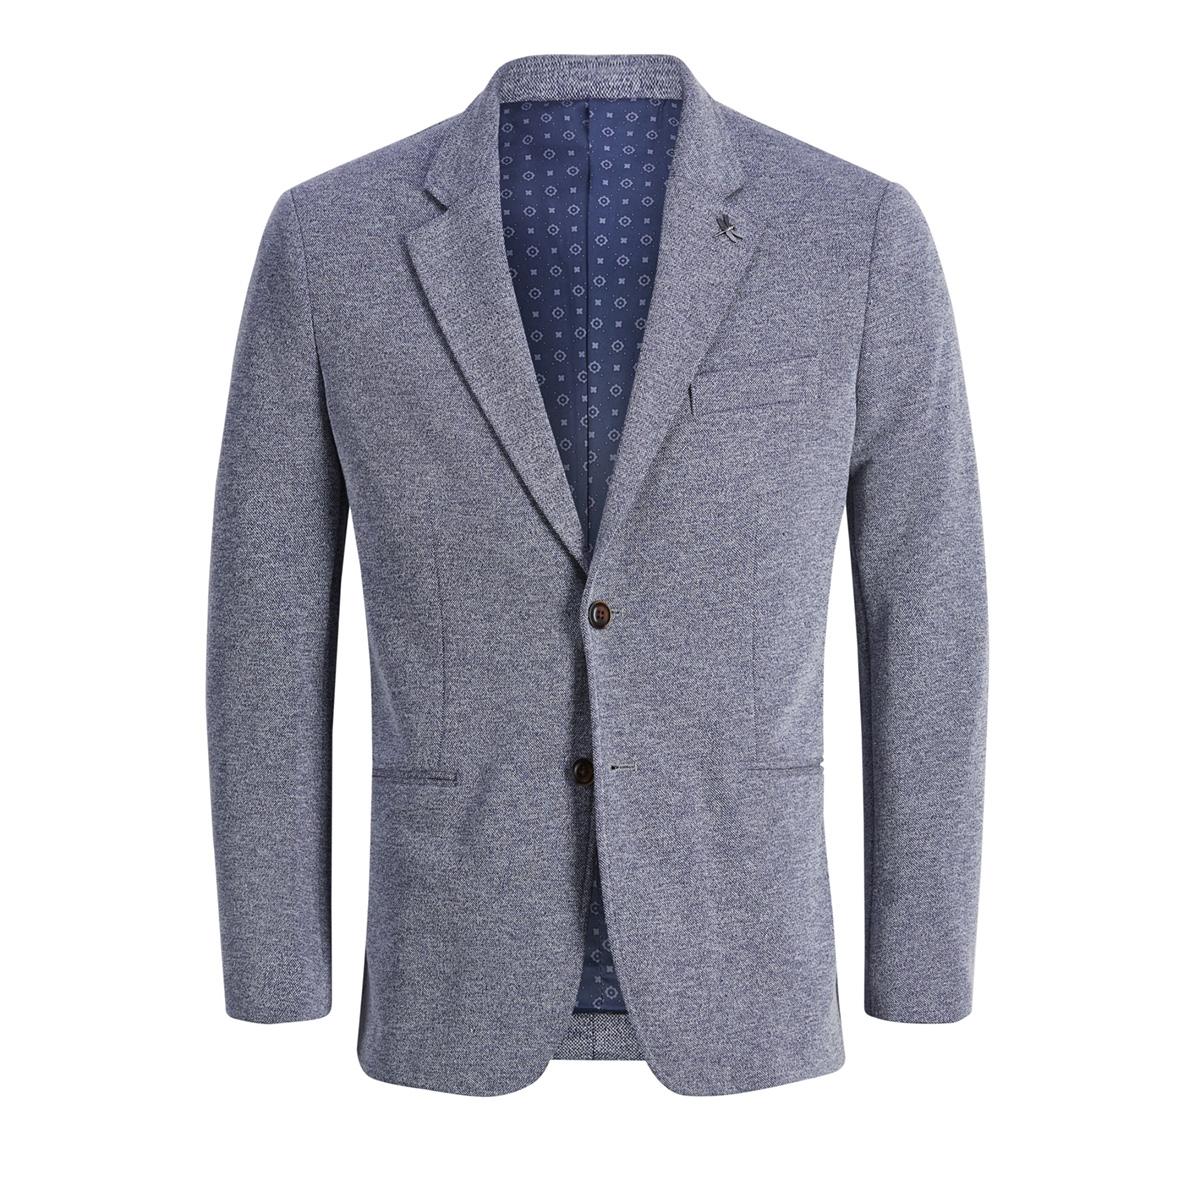 jprsimon blazer noos 12149223 jack & jones colbert chambray blue